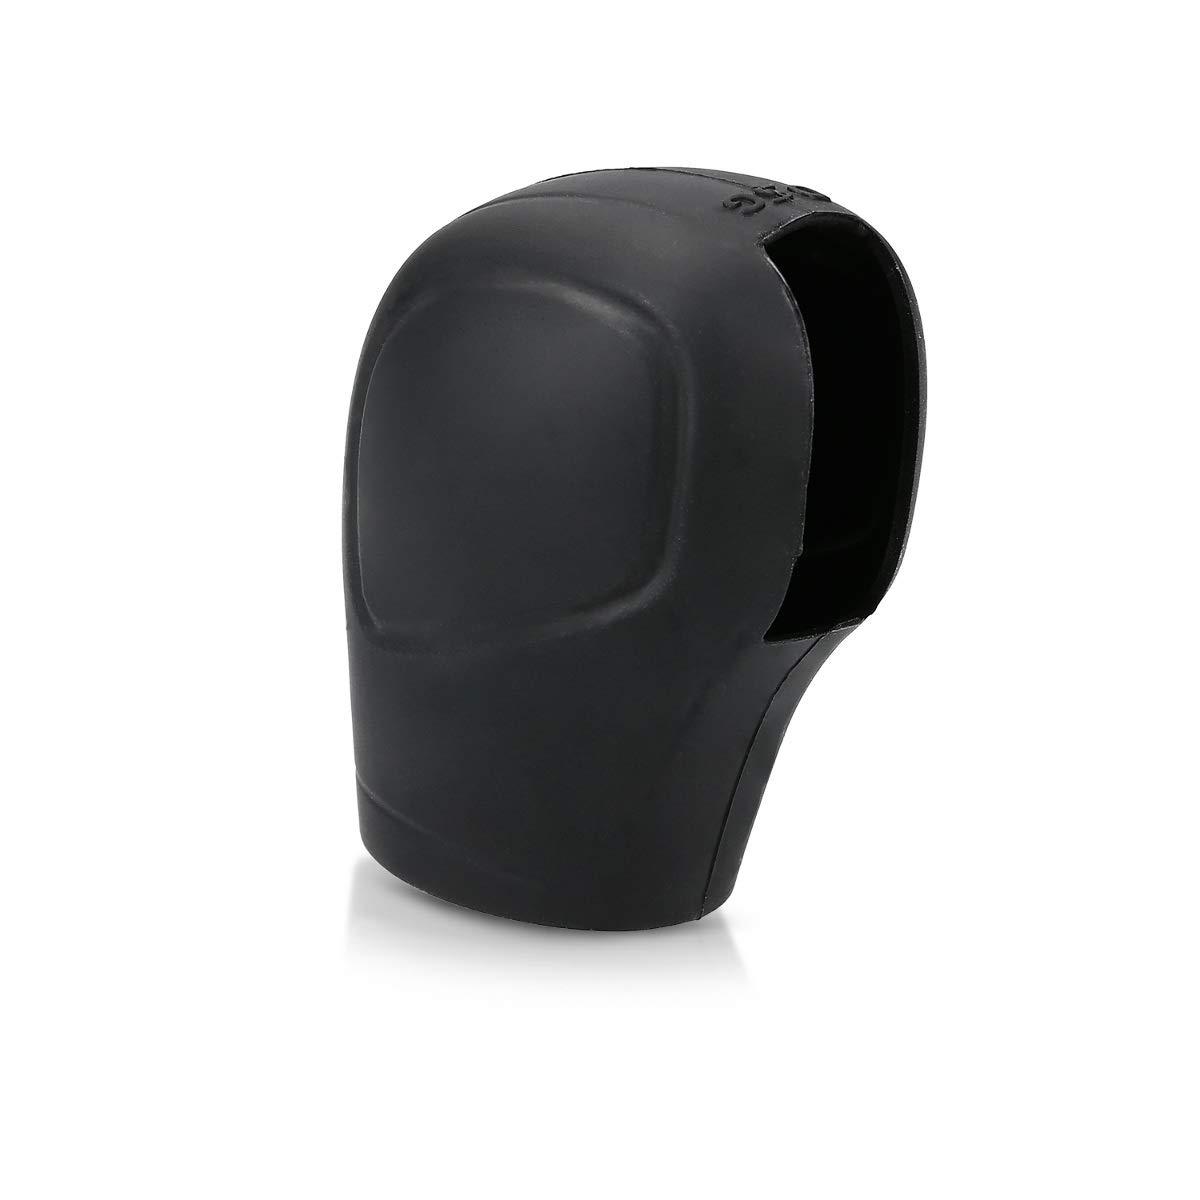 sourcingmap Universal Car Antislip Gear Shifter Shift Knob Cover Sleeve Black